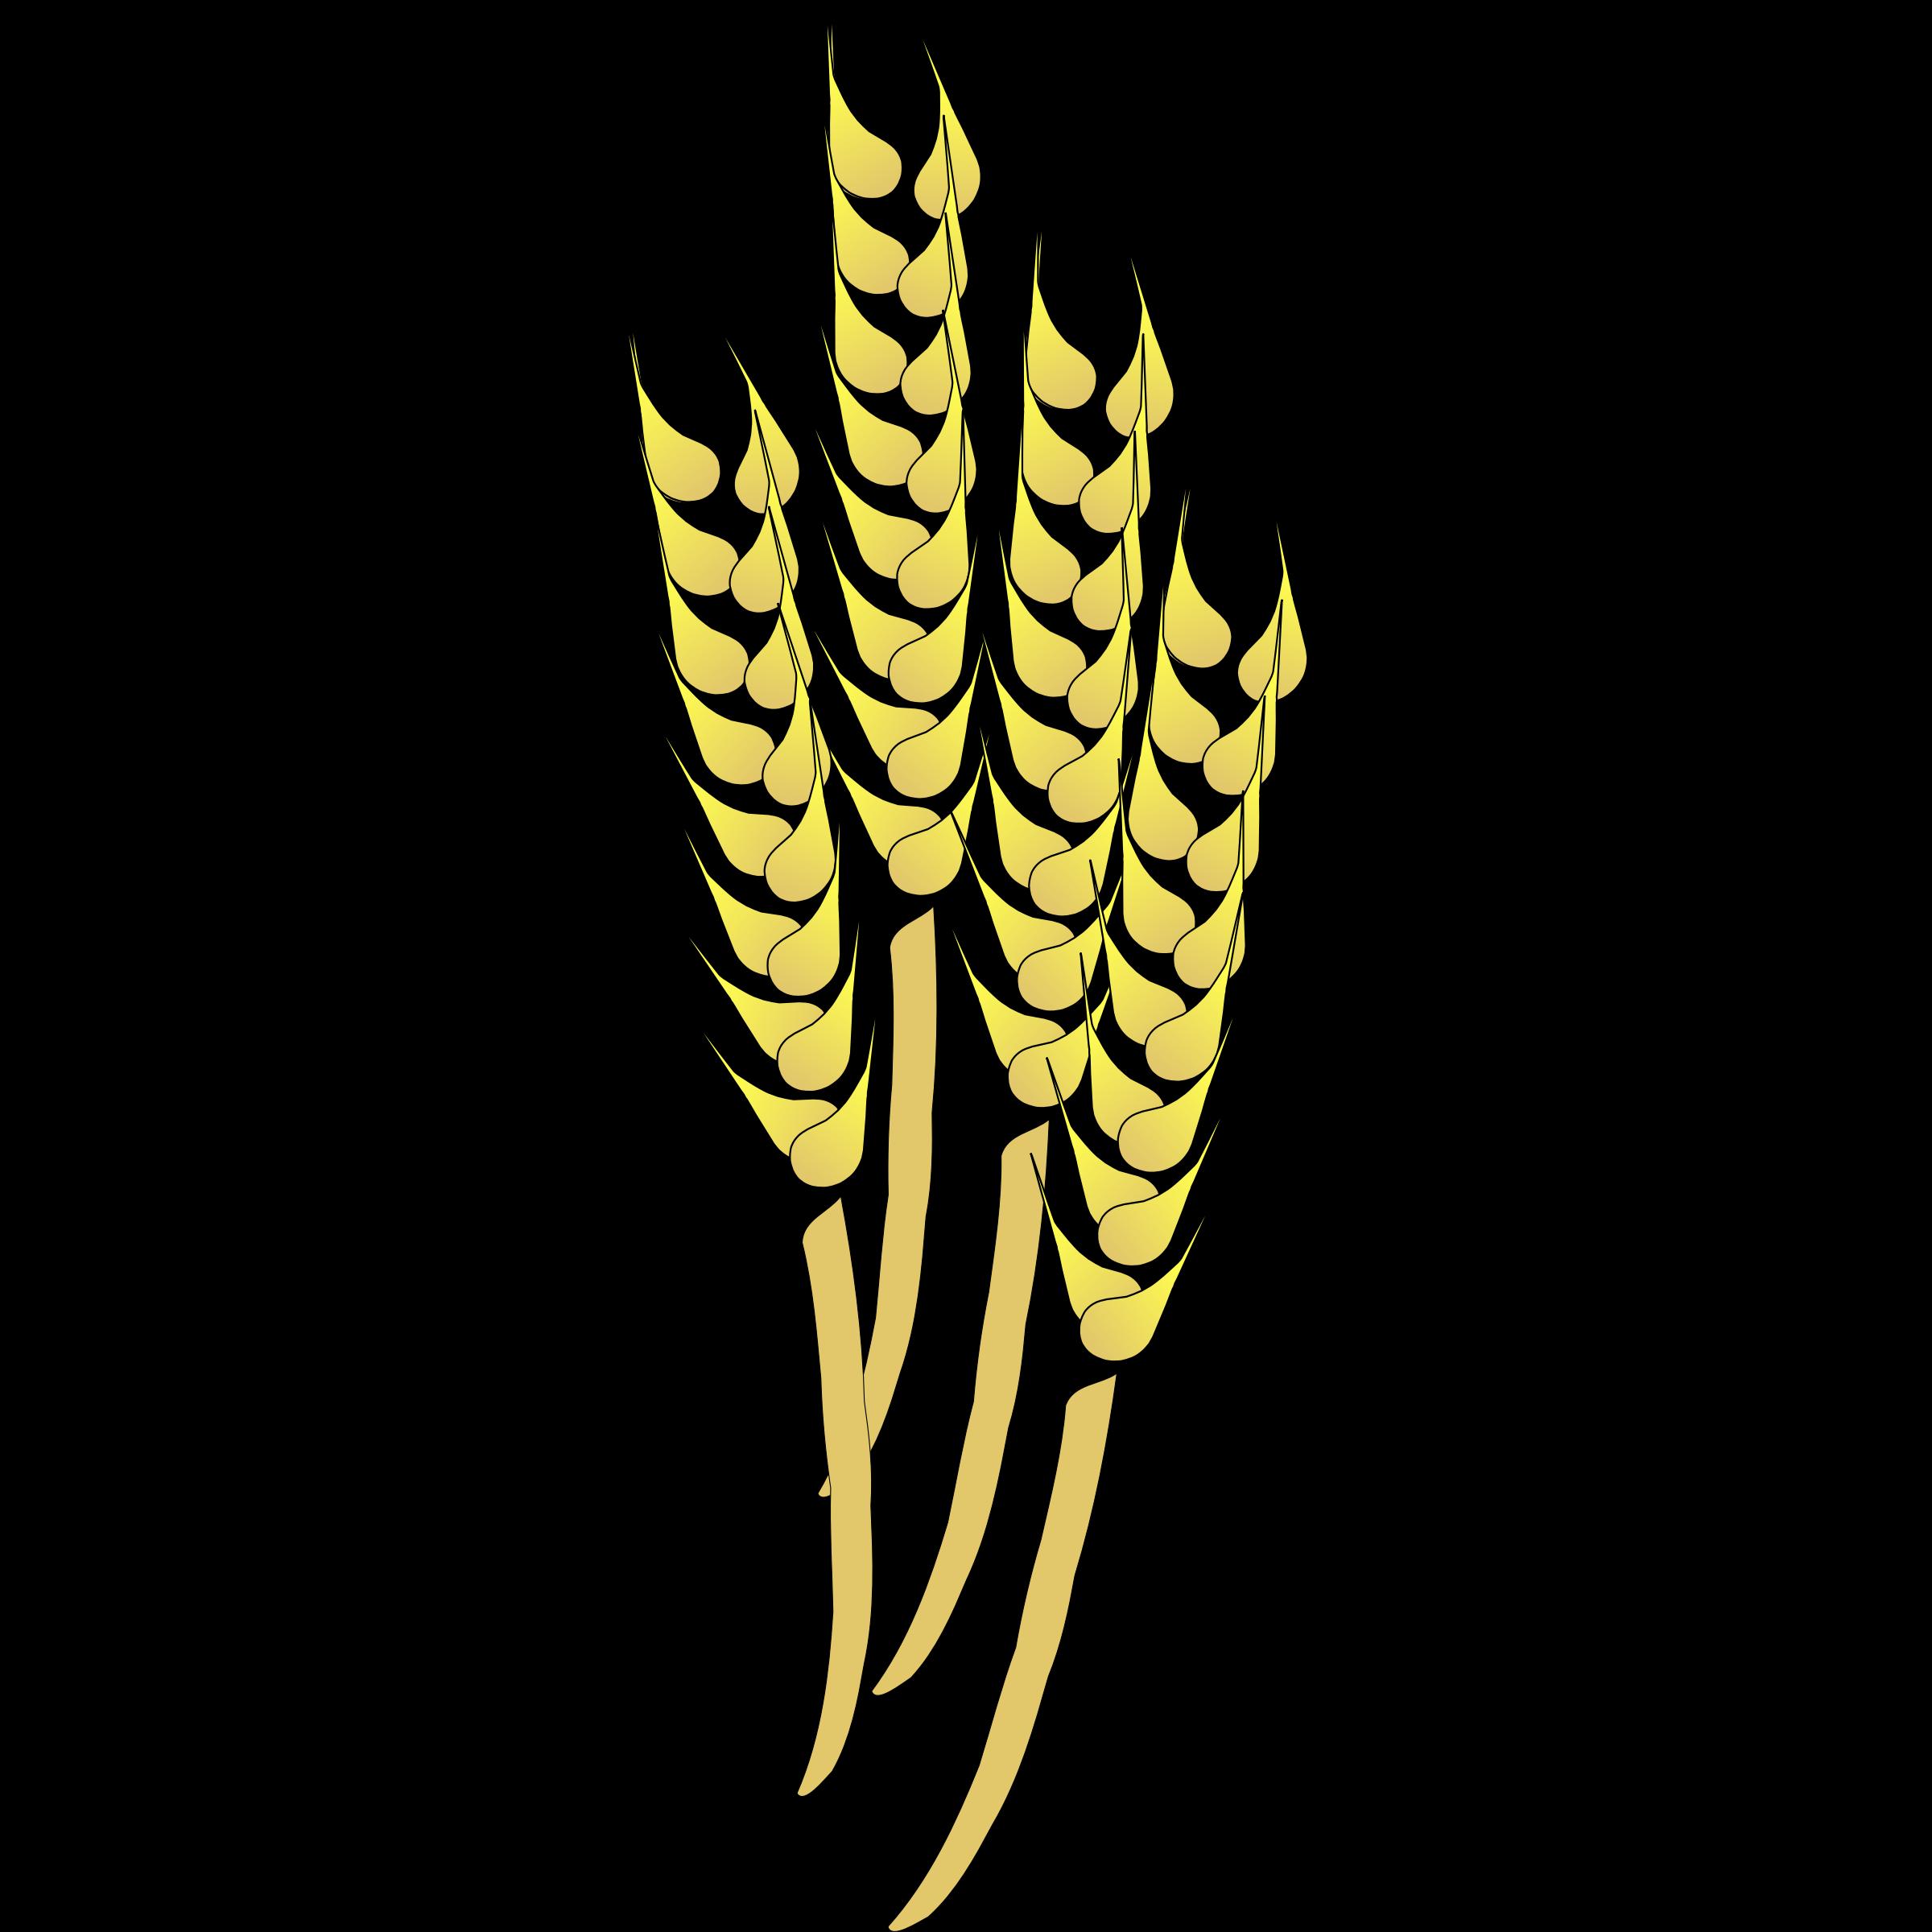 Wheat clip art